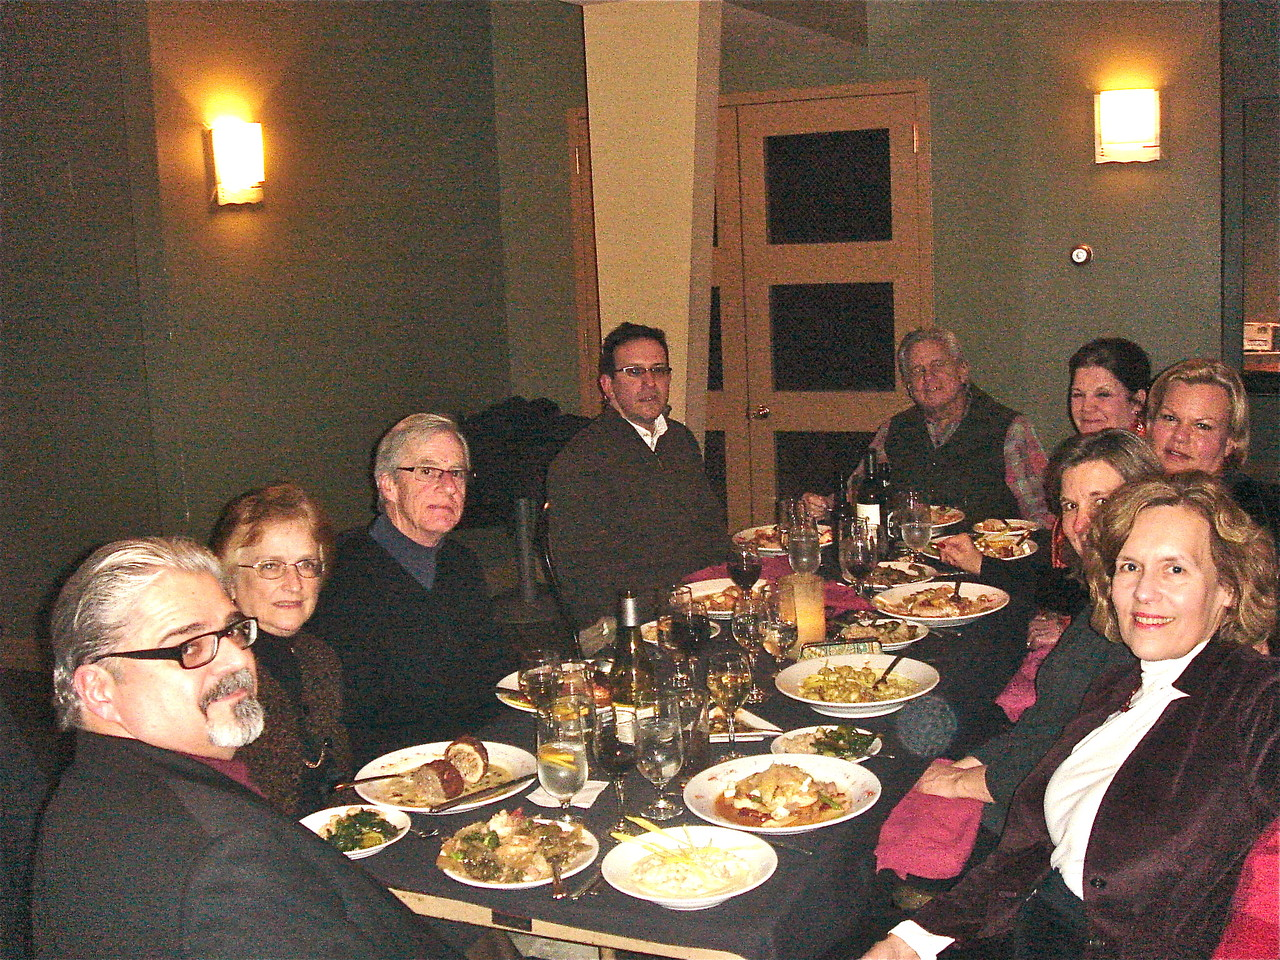 Robert Tringle, Jeanne Bednarski Sheridan, John Sheridan, Nick Signorelli, Stuart Kagel, Jean Tringle, Celeste Gudas, Cyndi Signorelli, & Lorraine Gudas